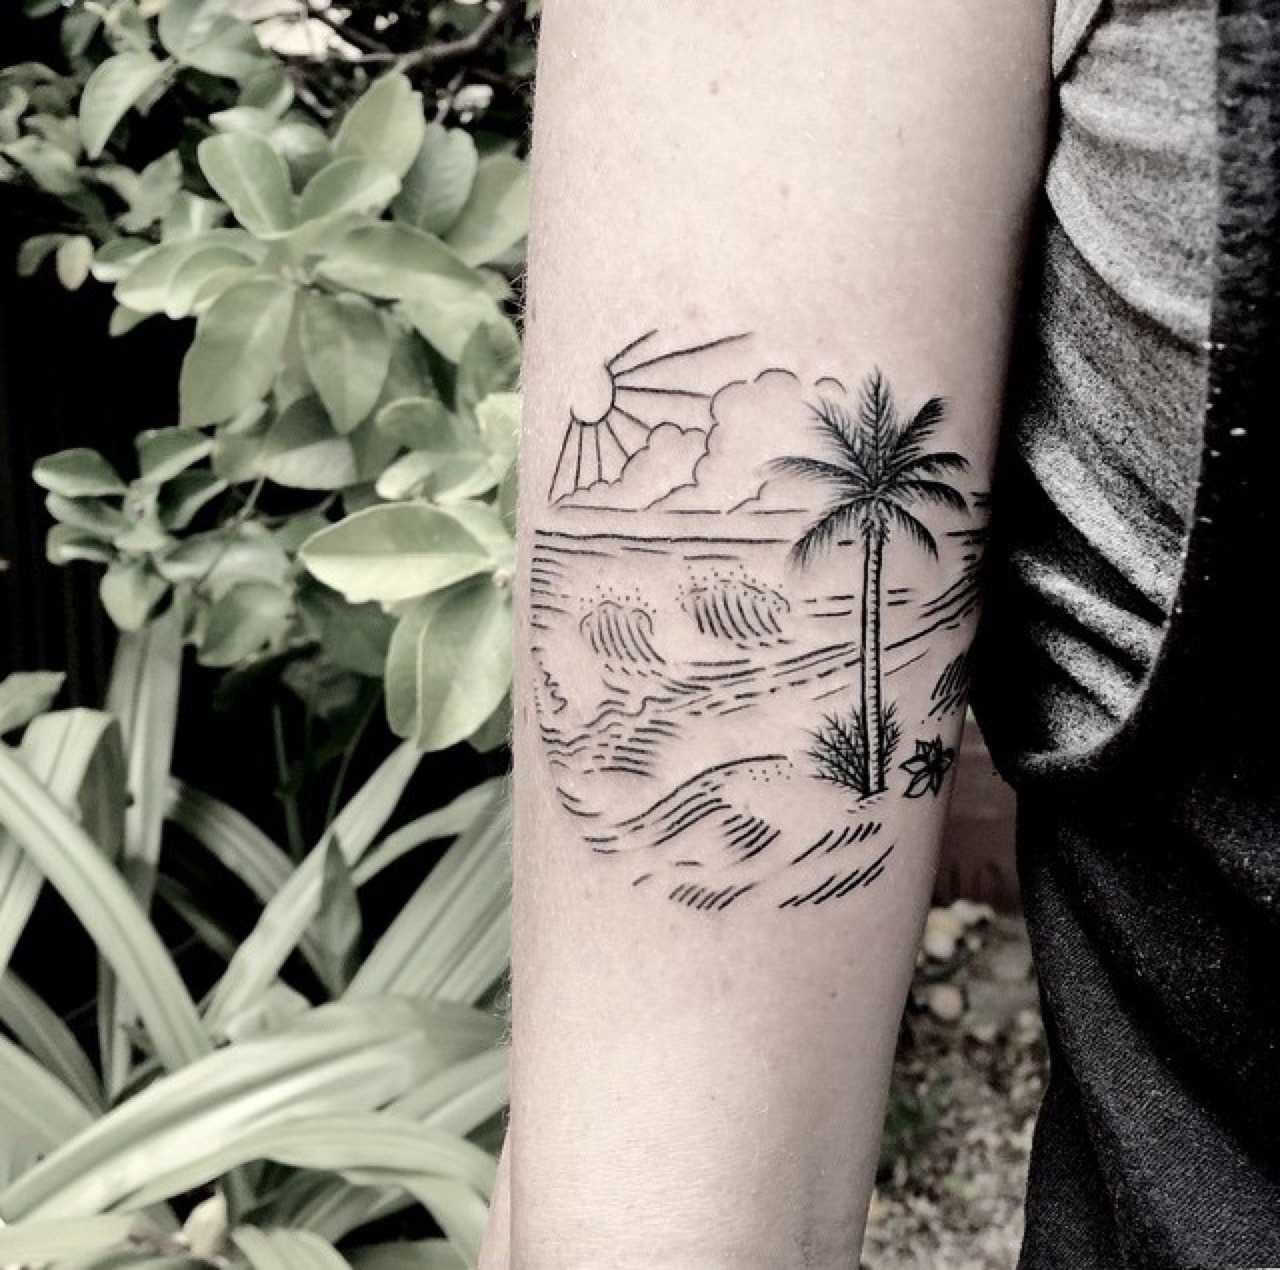 Beach scene tattoo on the forearm